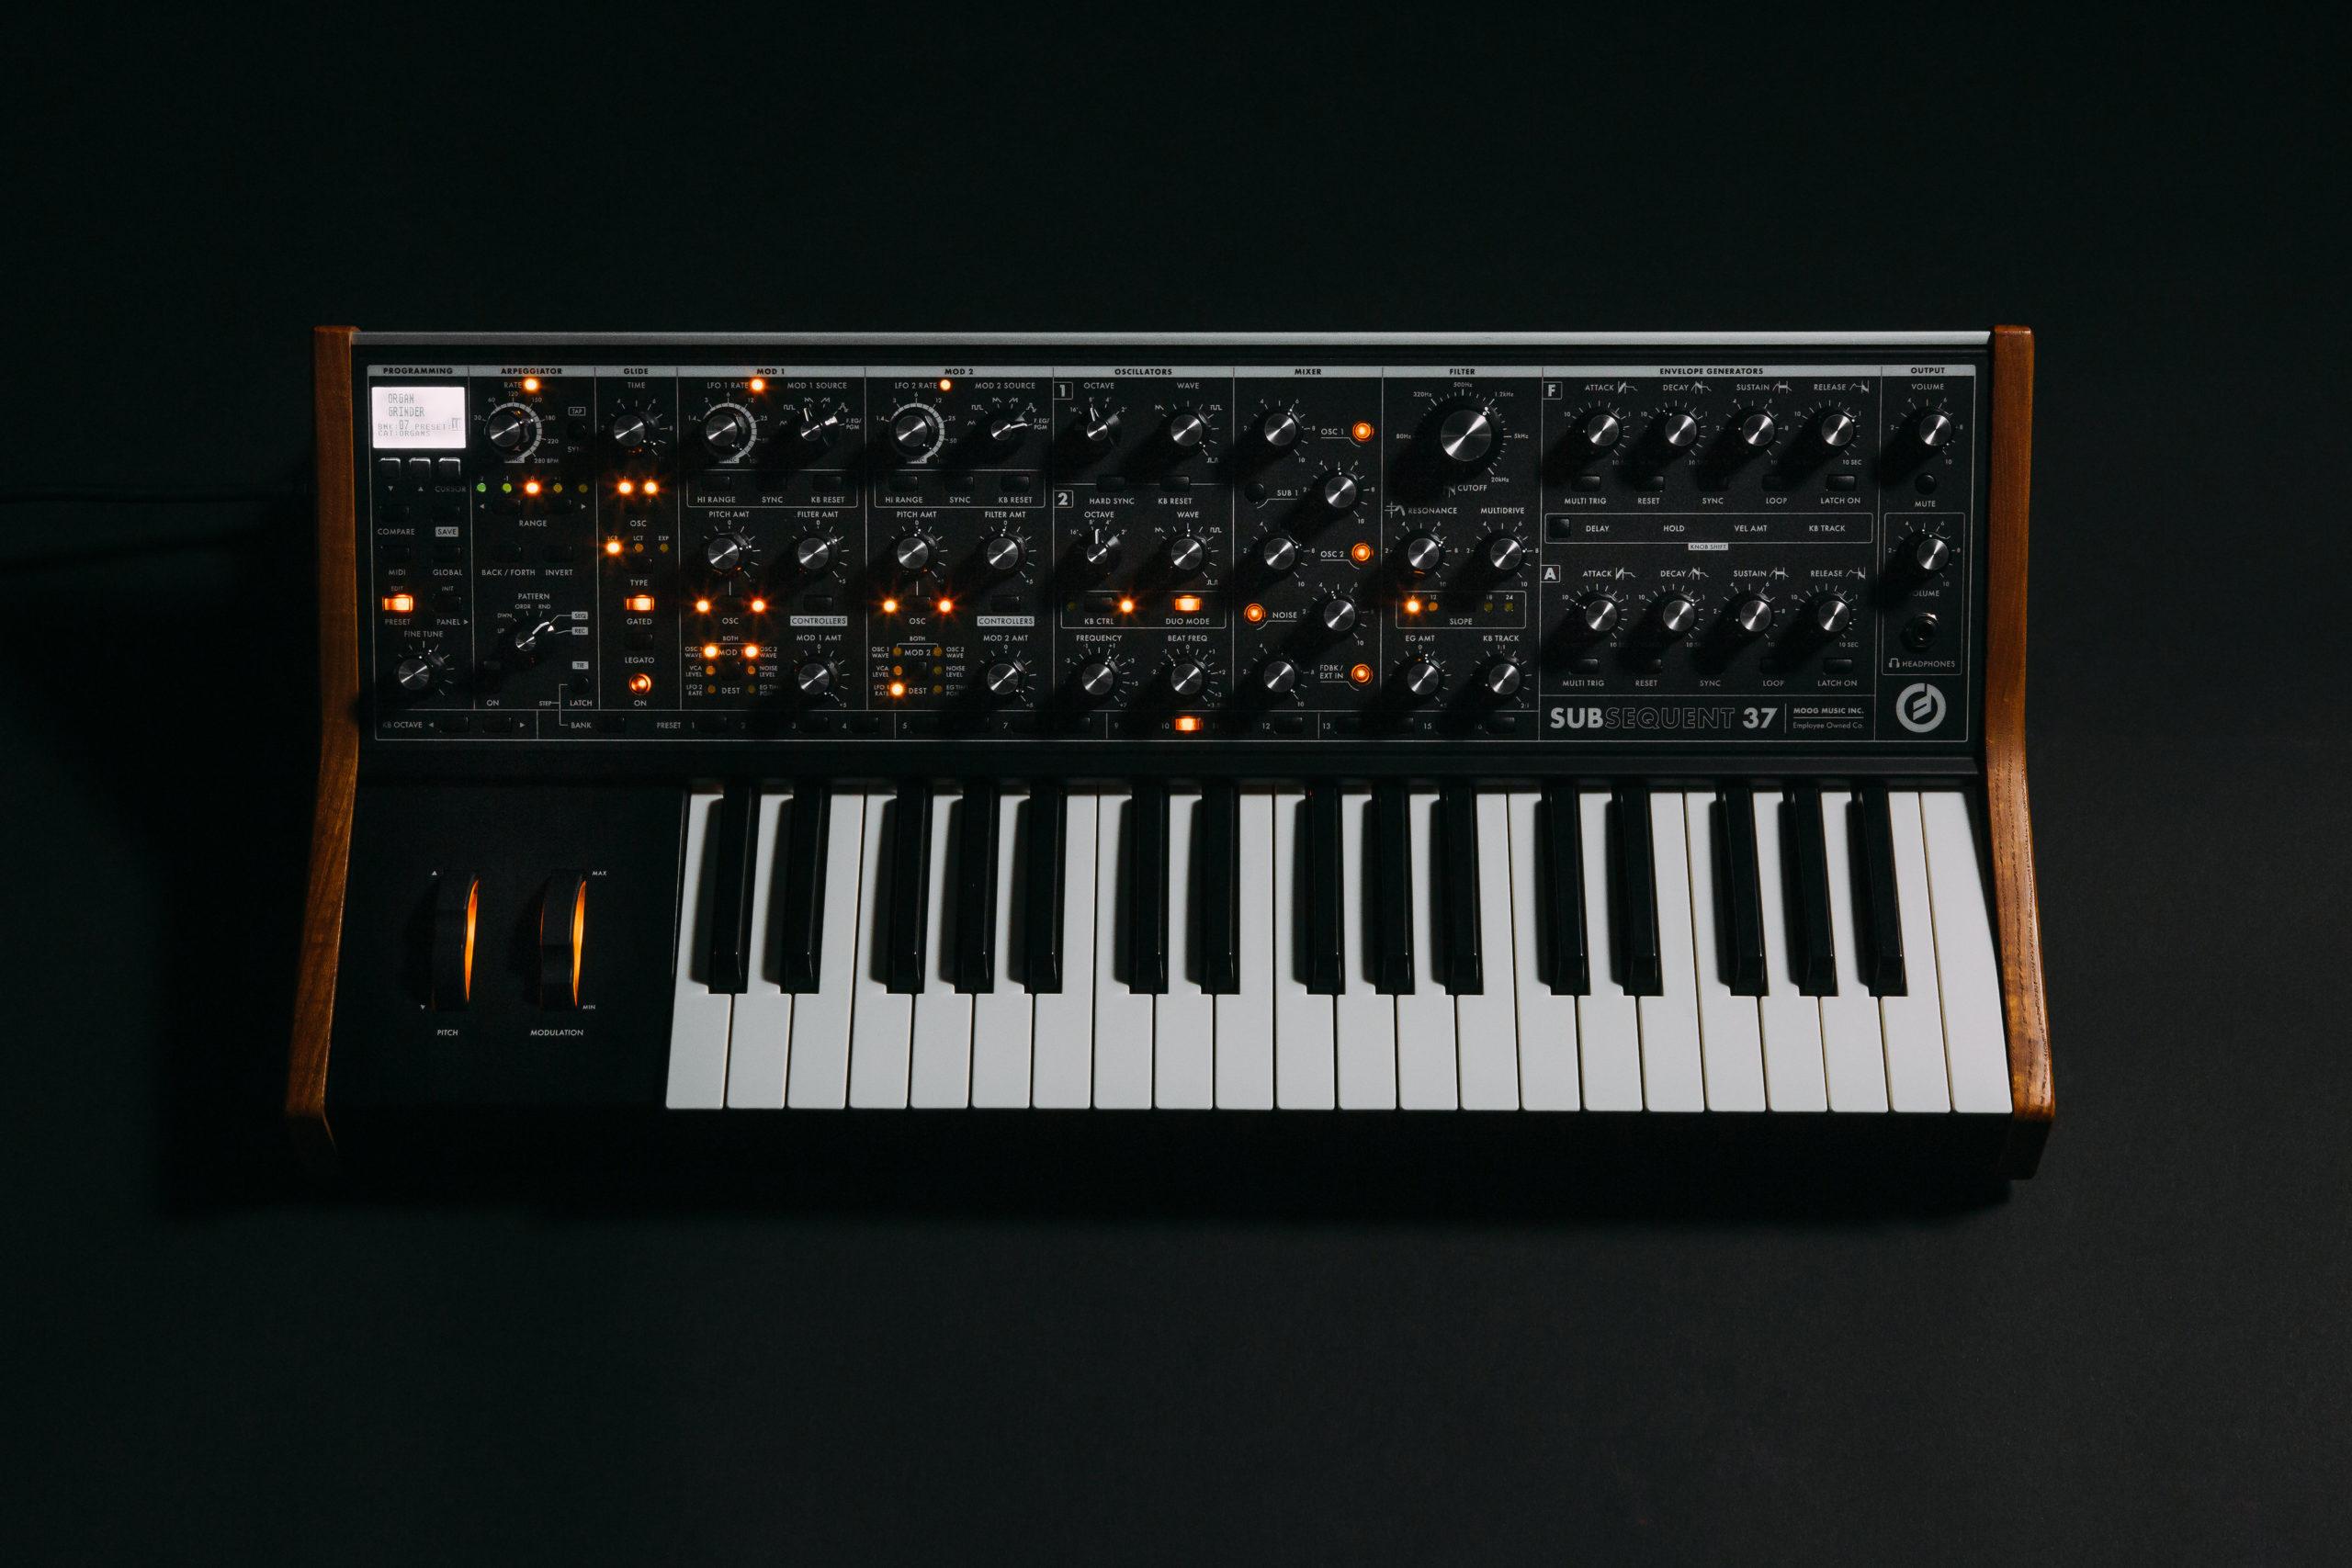 Synthétiseur Analogique Moog